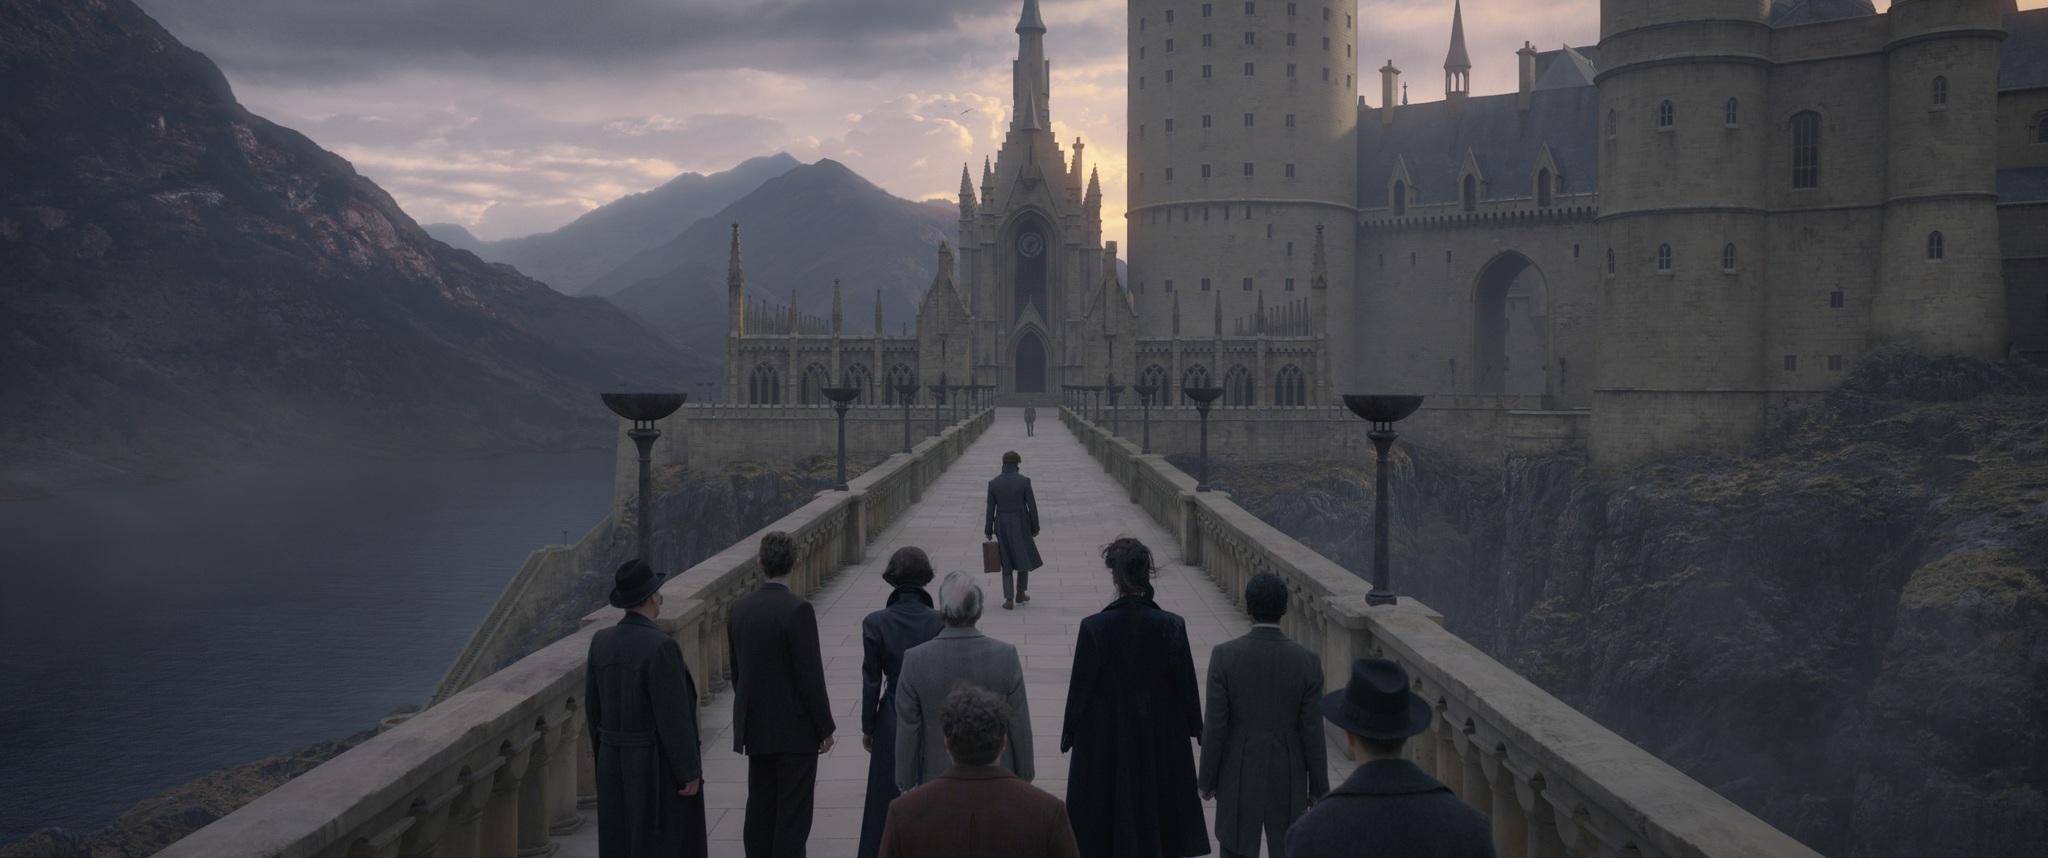 Jude Law, Dan Fogler, Eddie Redmayne, Katherine Waterston, Claudia Kim, and Callum Turner in Fantastic Beasts: The Crimes of Grindelwald (2018)